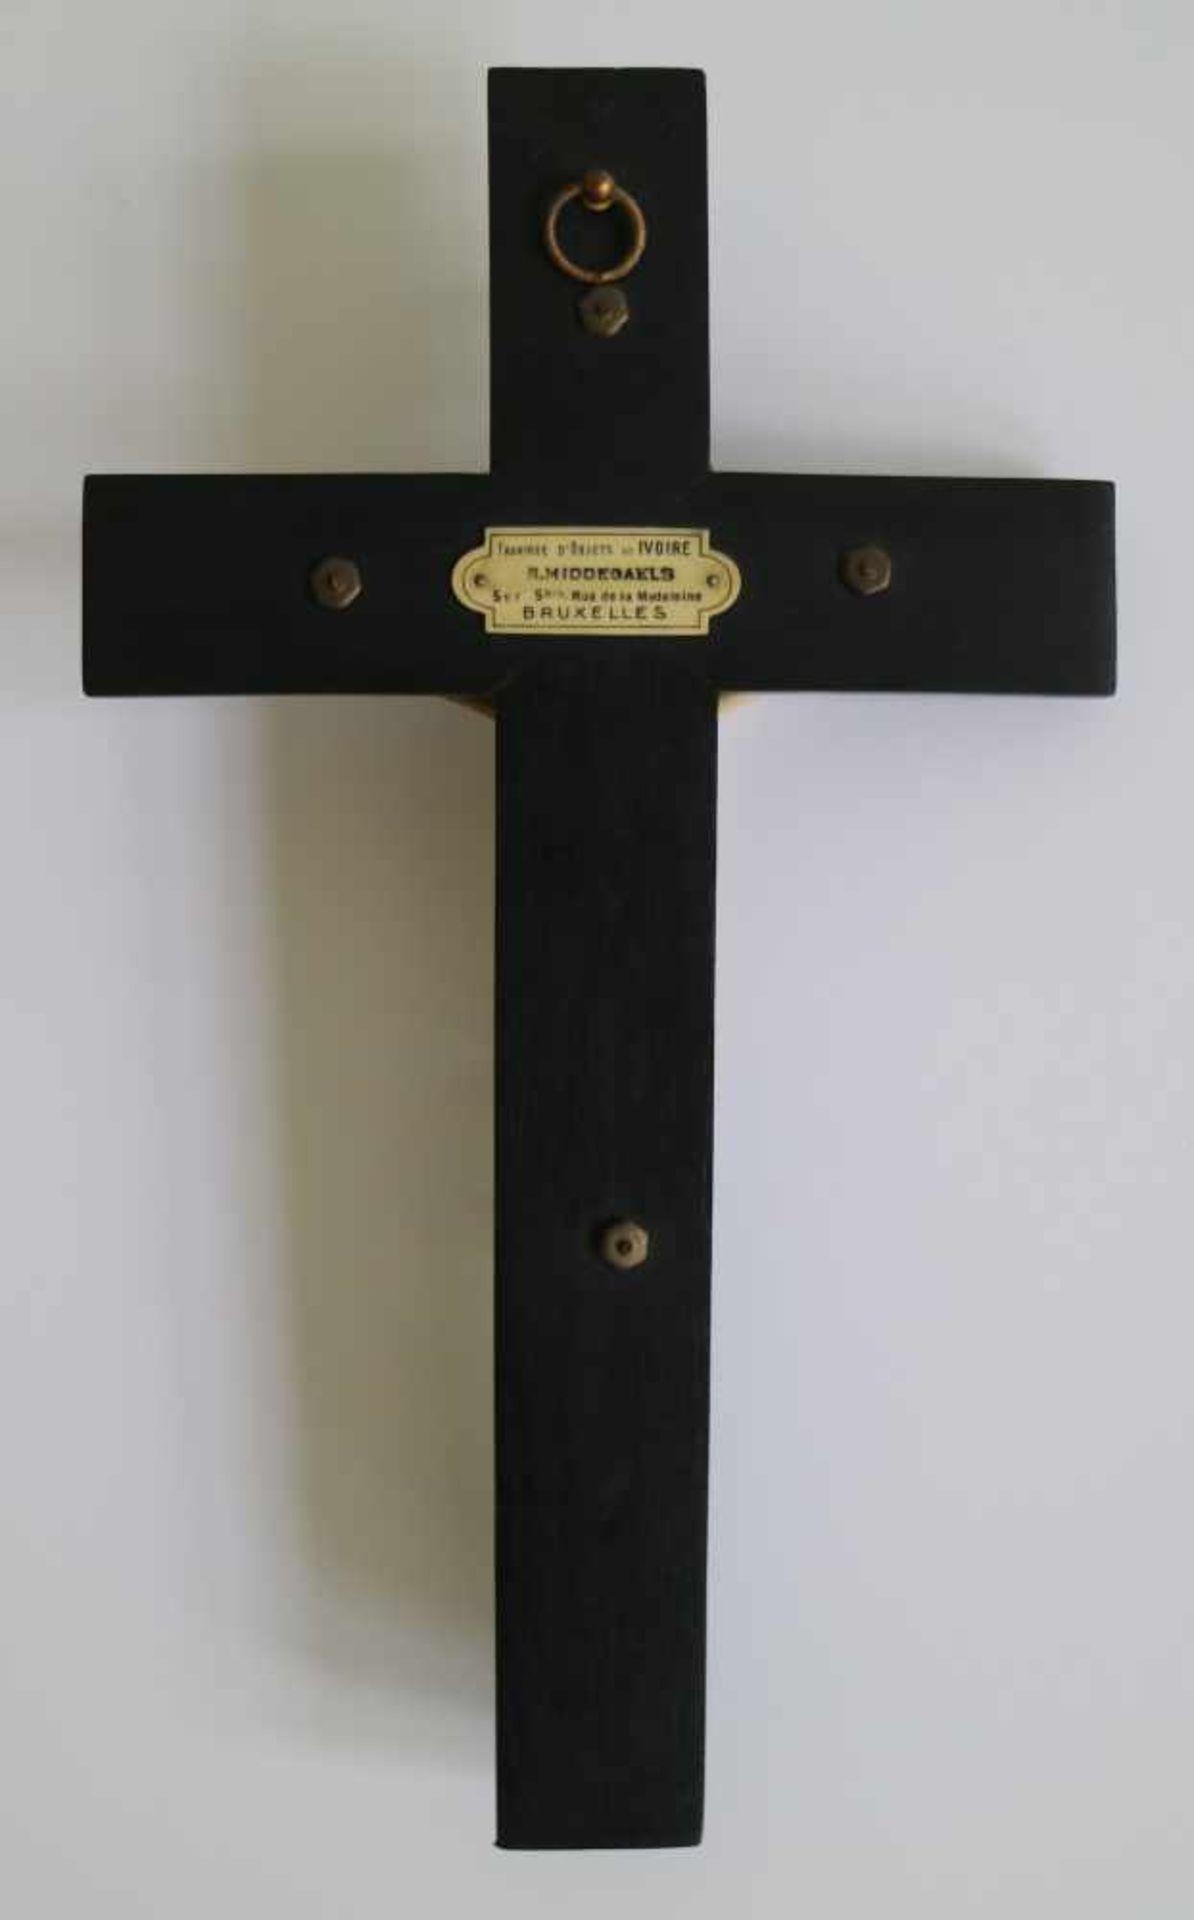 Corpus Christi ivory verso plaque R. Middegaels Bruxelles H 25 B 14 cm (H corpus christi 10 cm) - Bild 3 aus 3